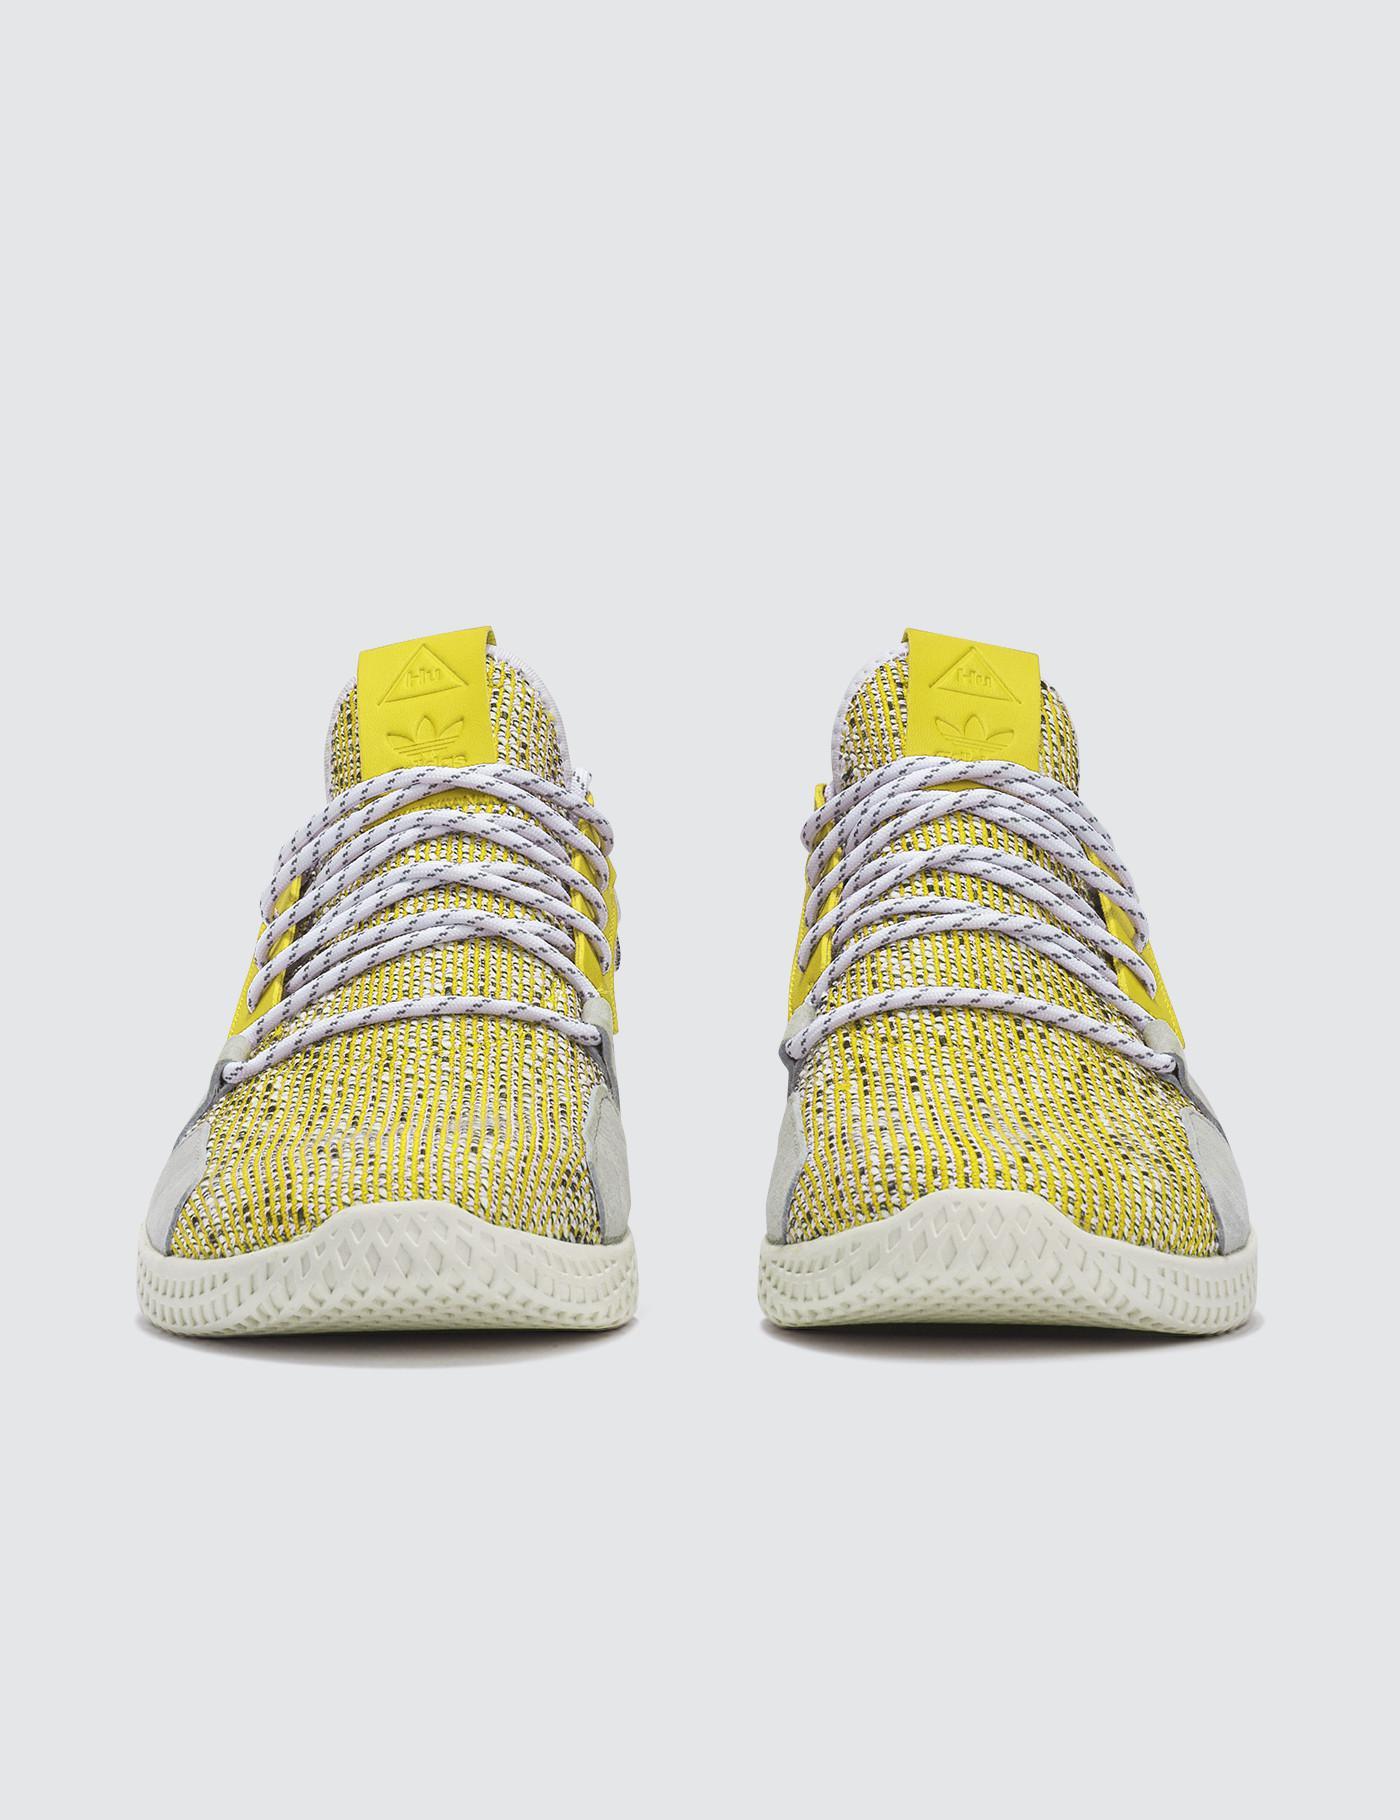 best service 20519 e31c1 adidas Originals Pharrell Williams X Adidas Solar Hu Tennis V2 in Yellow -  Lyst